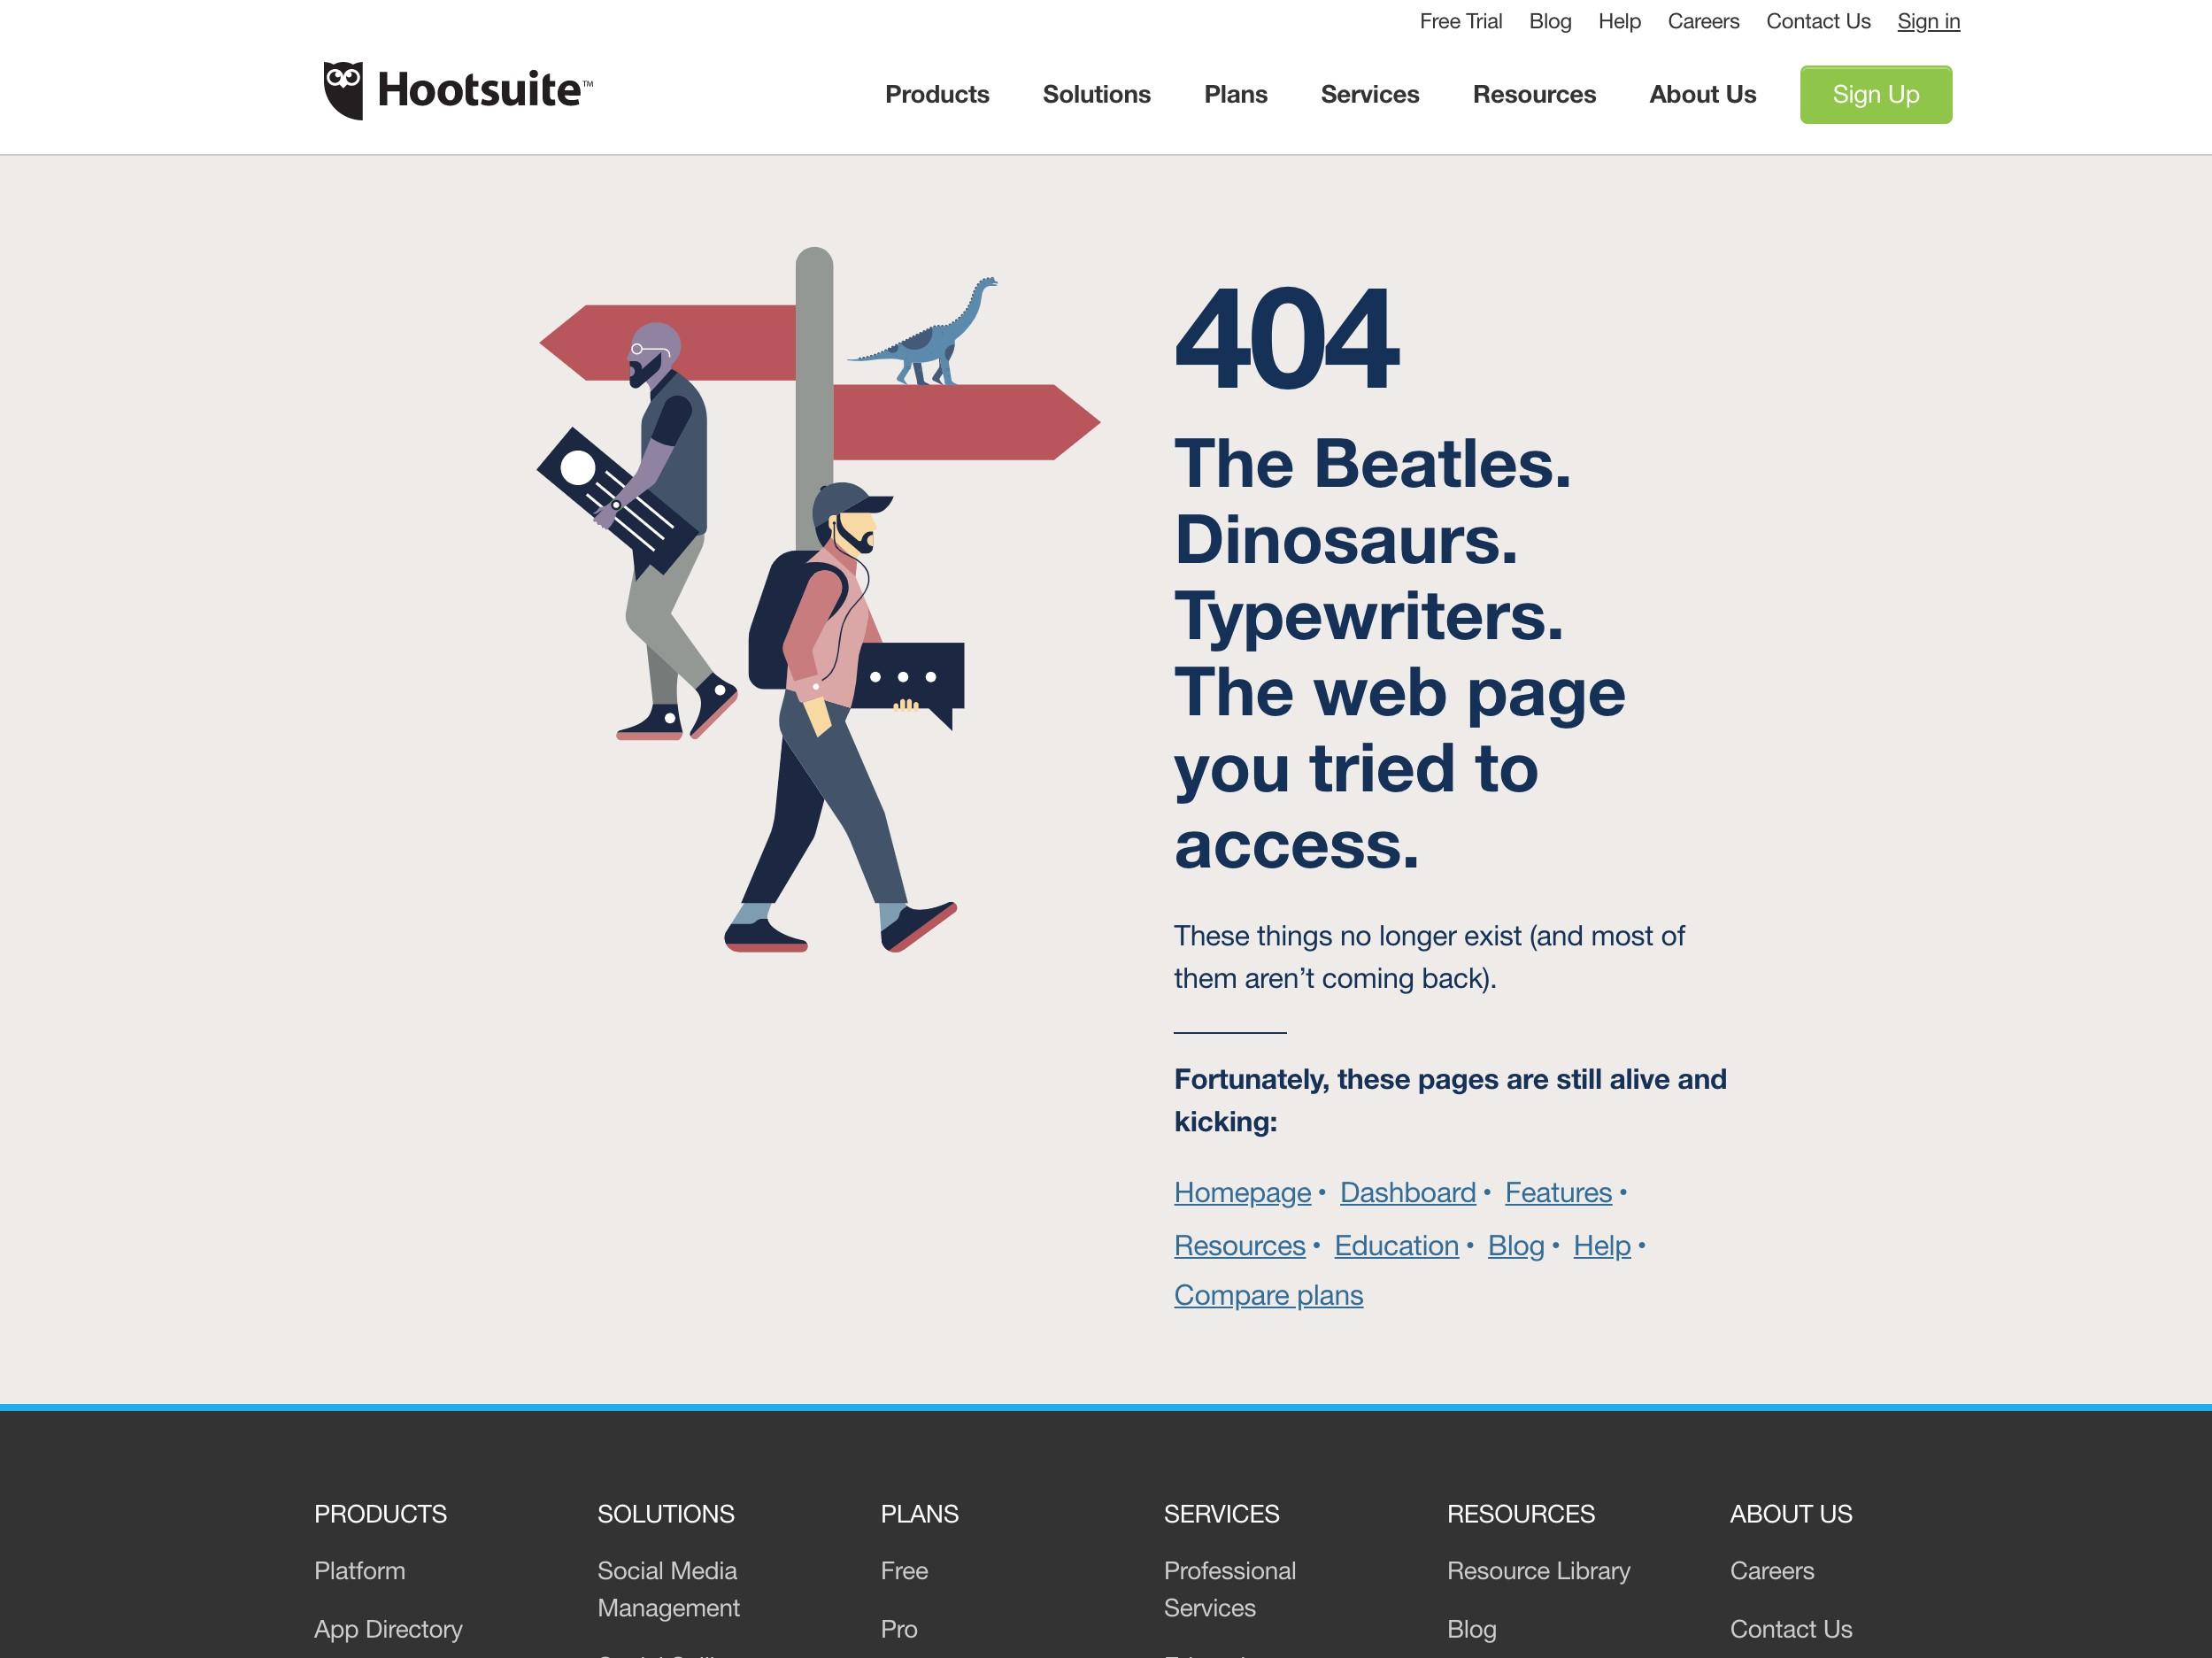 Hootsuite 404 Error